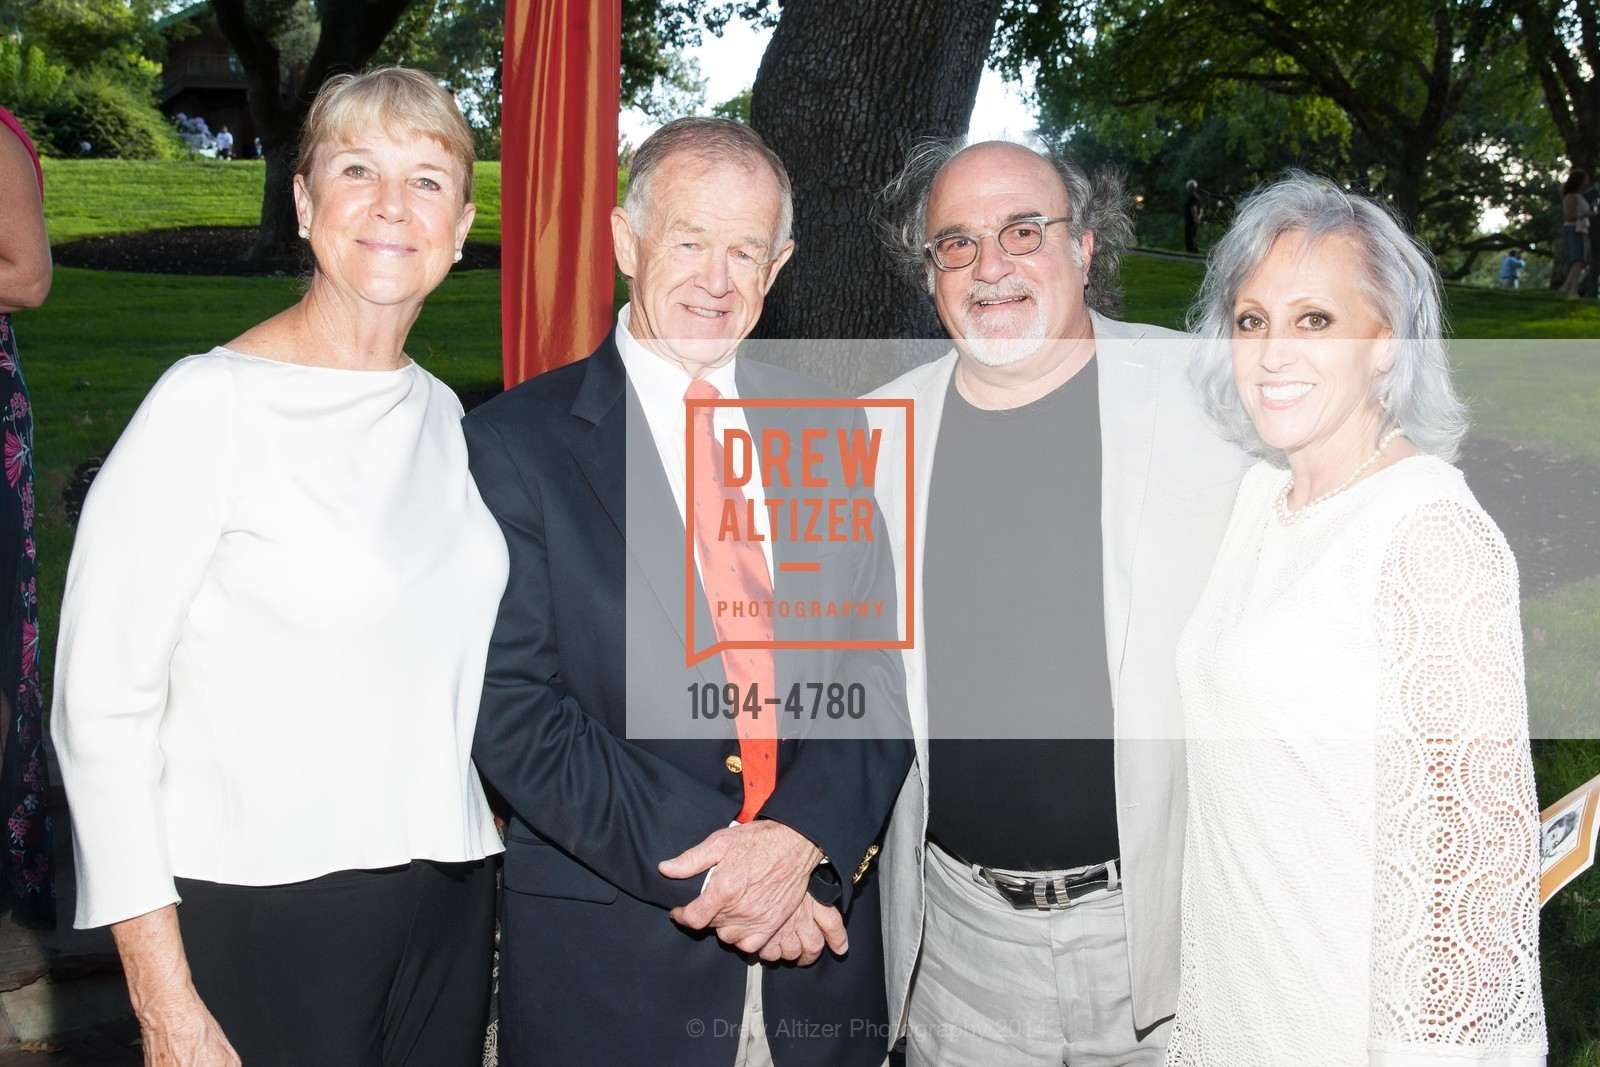 Robin Lail, Jon Lail, Tom Rodriguez, Cindy Hollinger, Photo #1094-4780